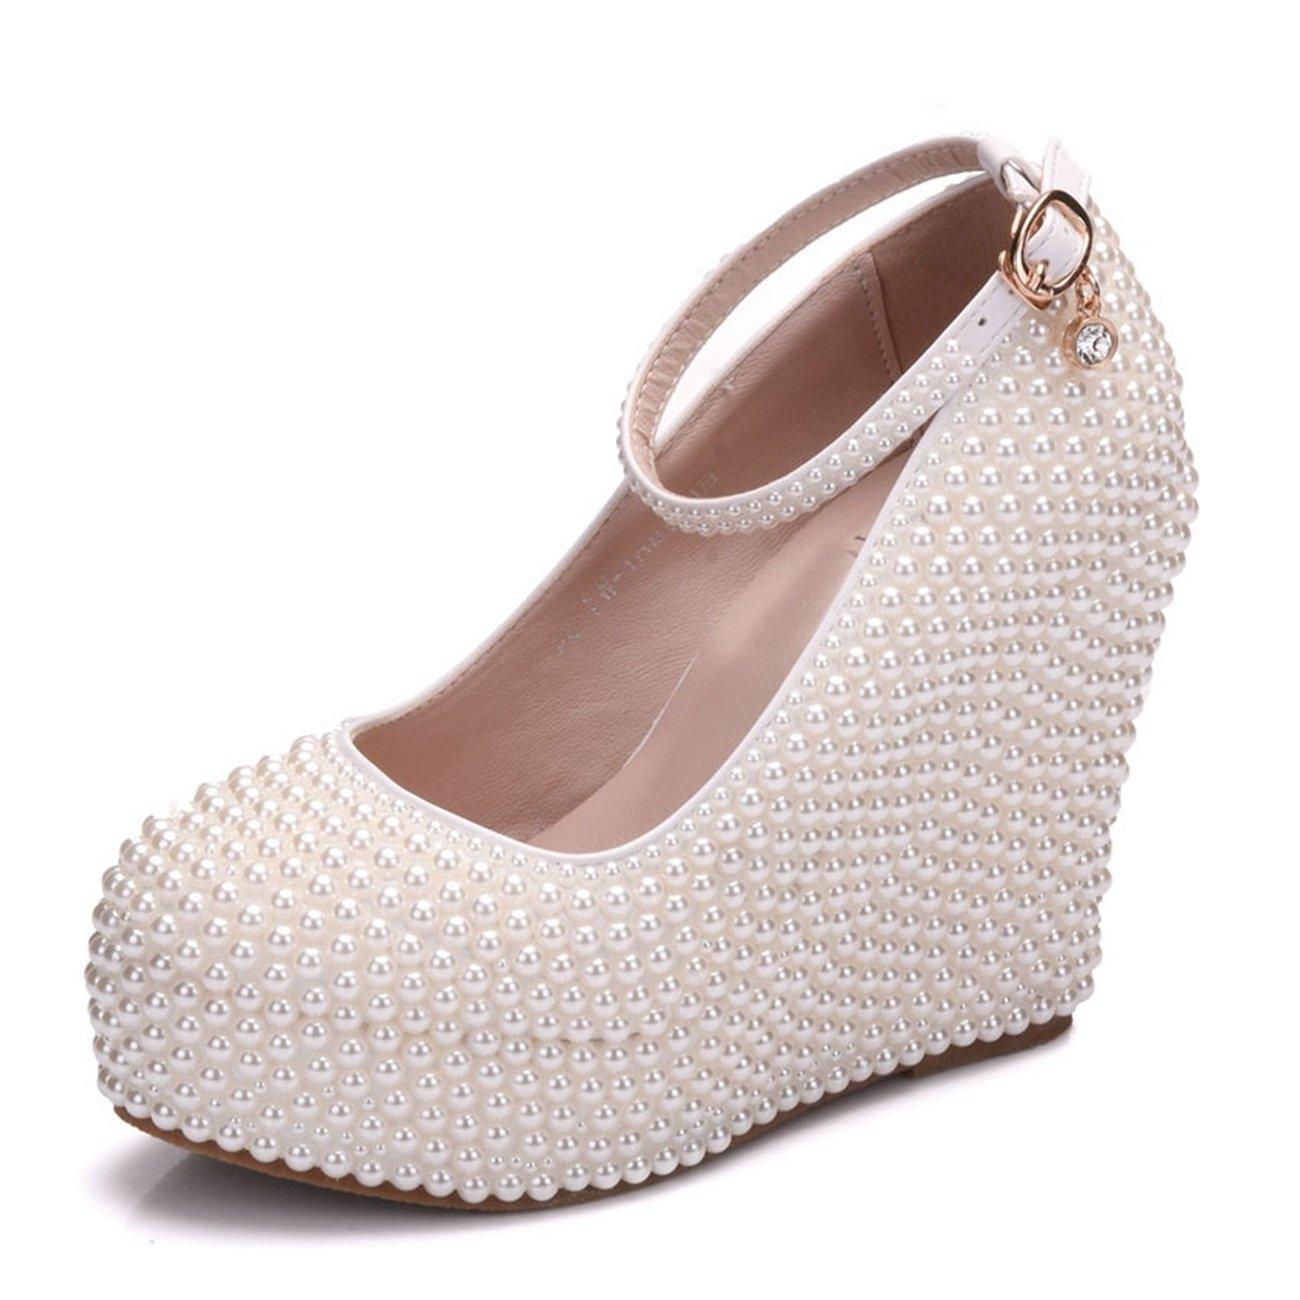 Minishion Womens Hidden High Platform Pearl Beading Wedge Heel Wedding Evening Shoes B0754ZF4SH 6.5 B(M) US|Ivory-10cm Heel